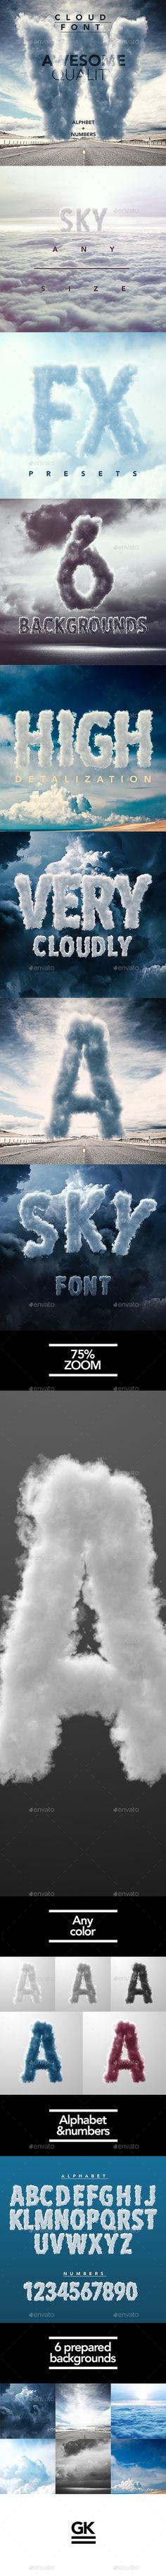 3D Sky / Cloud font mock up Design Template PSD - Miscellaneous Product Mock-Ups. Download here: http://graphicriver.net/item/3d-sky-cloud-font-mock-up/12955563?s_rank=17&ref=yinkira